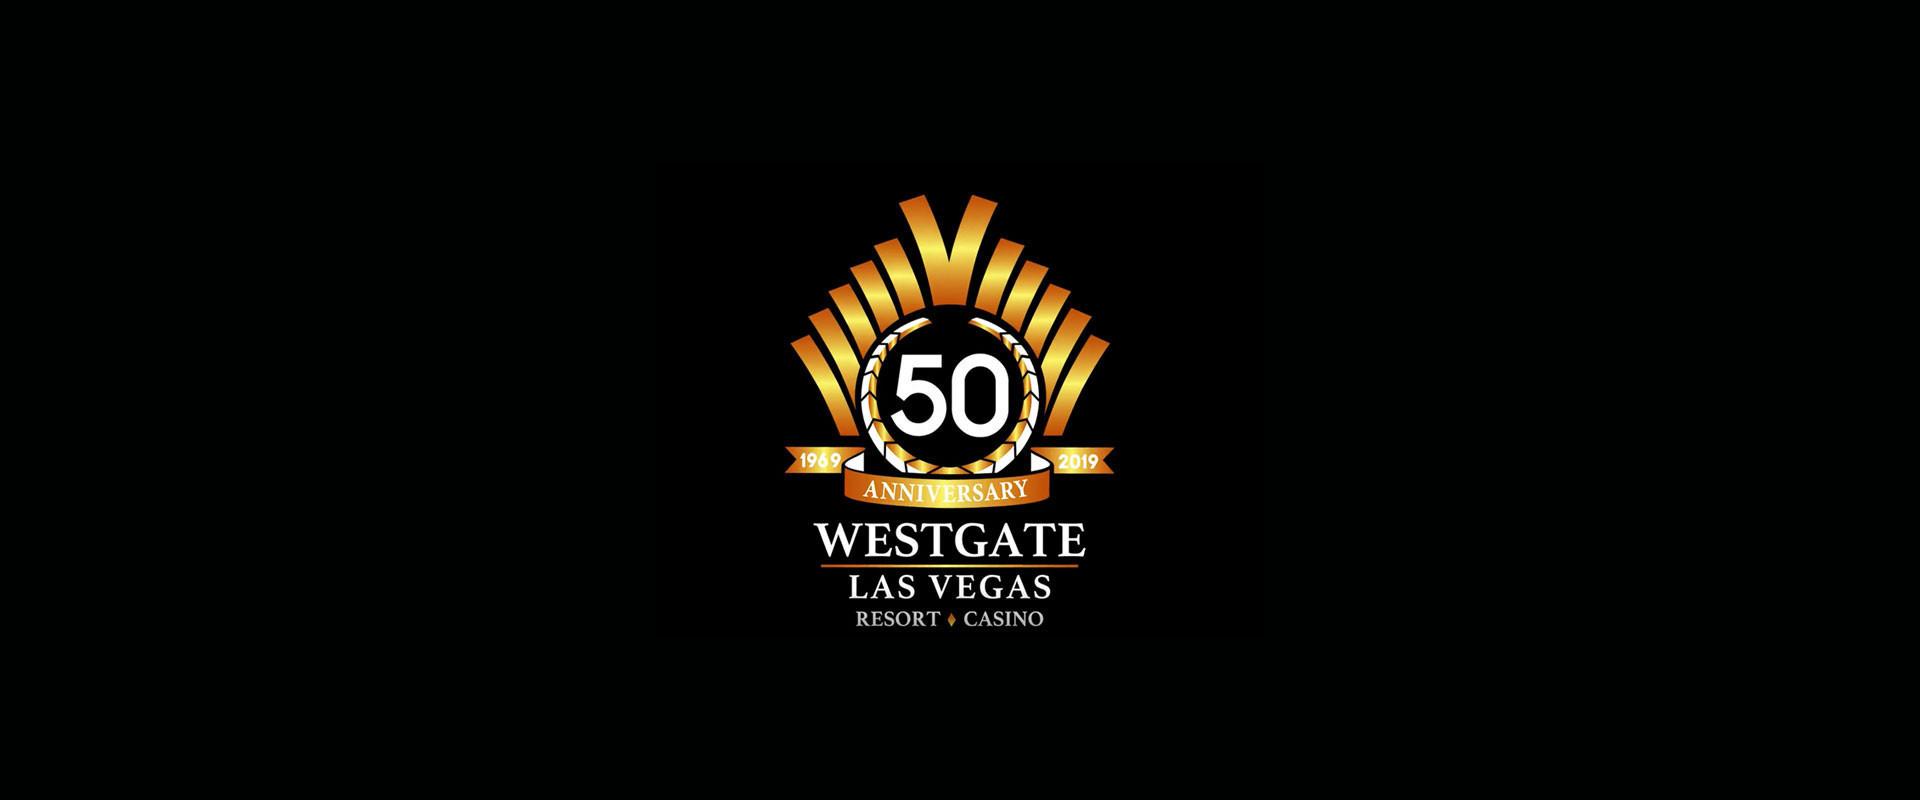 Celebrate 50 years of Legendary Vegas Fun with Westgate Las Vegas Resort & Casino.